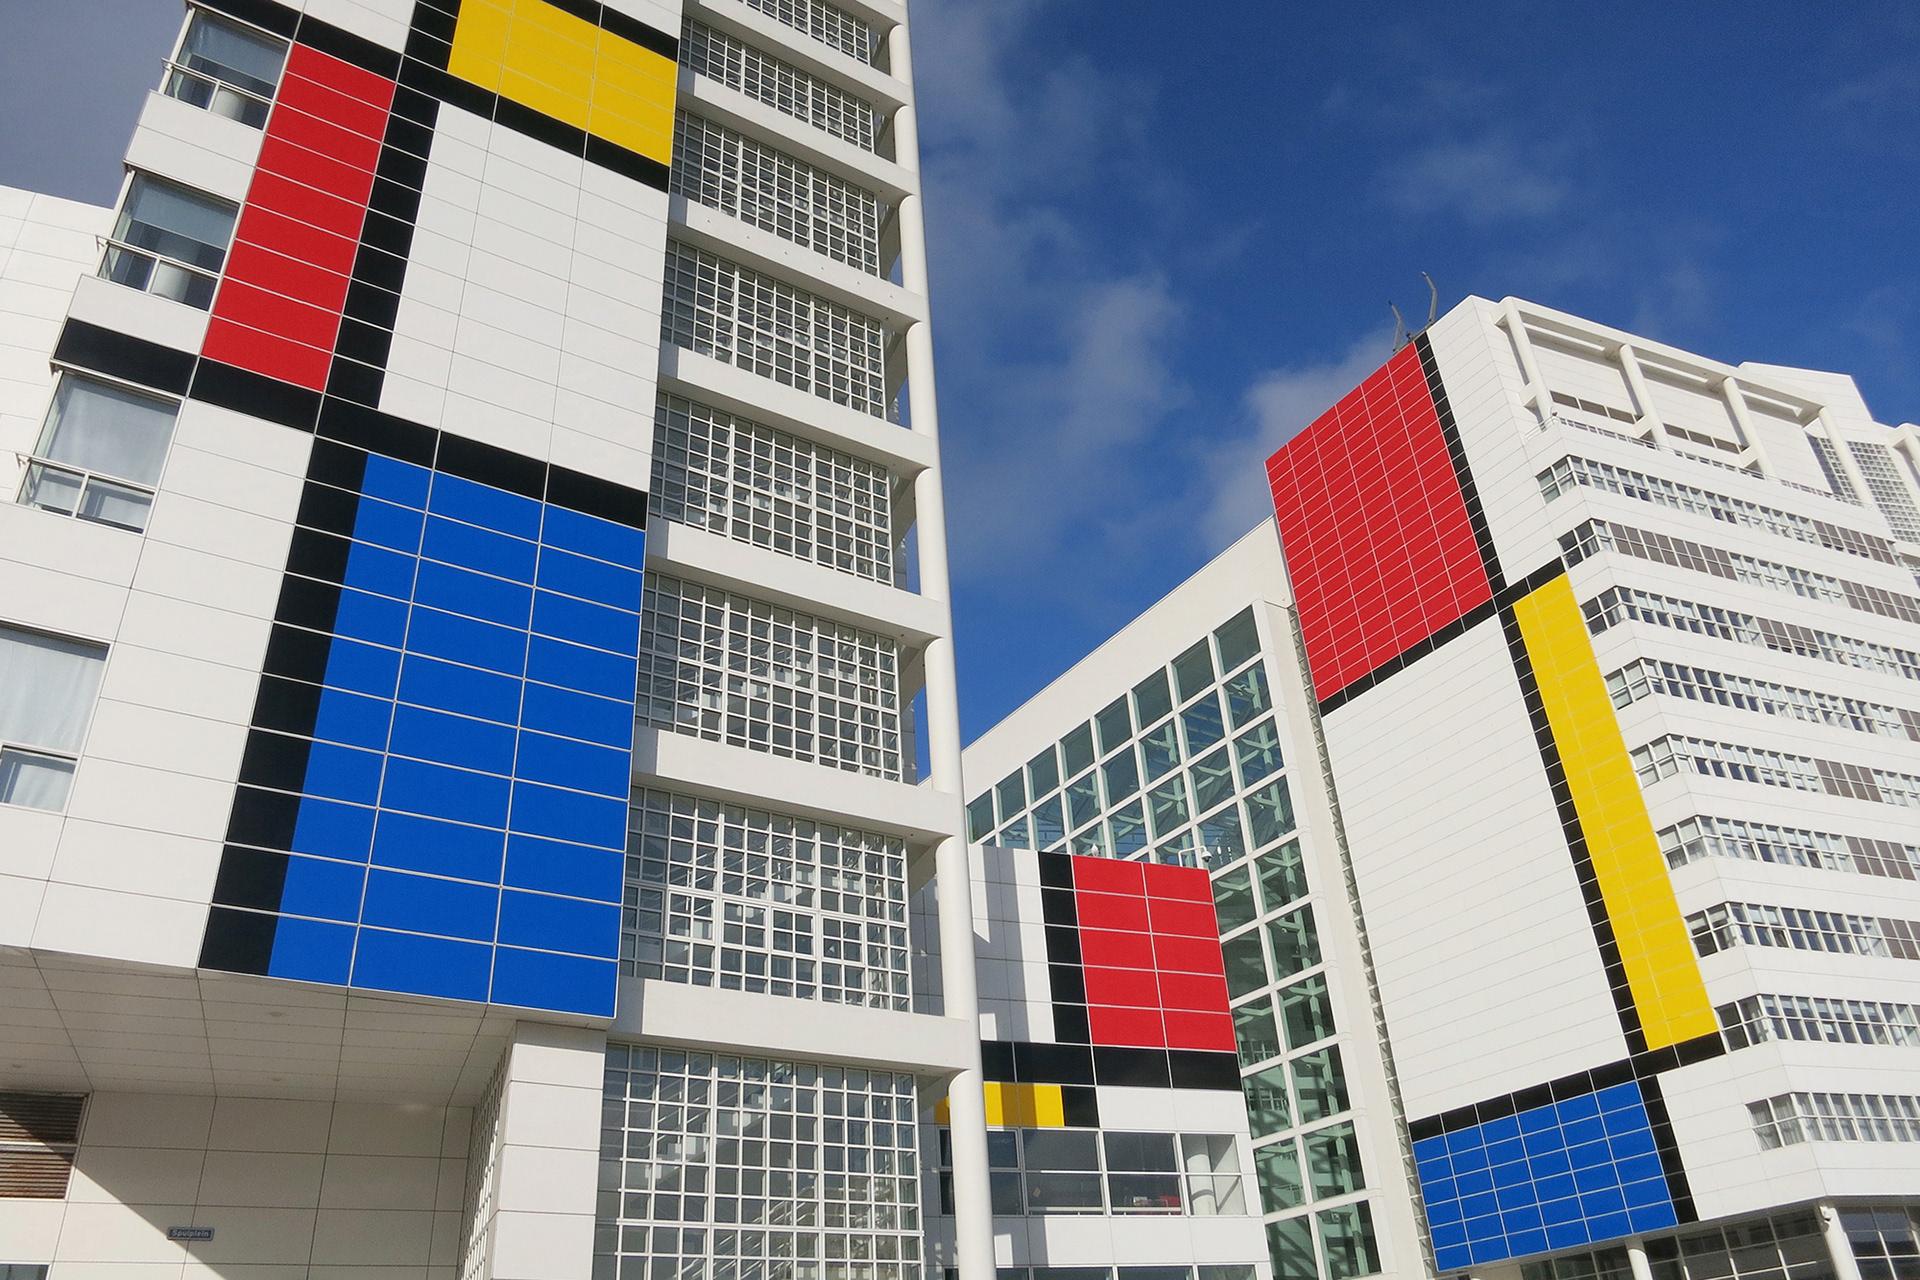 Tegels Den Haag : Studio vollaerszwart city dressing whos afraid of red yellow